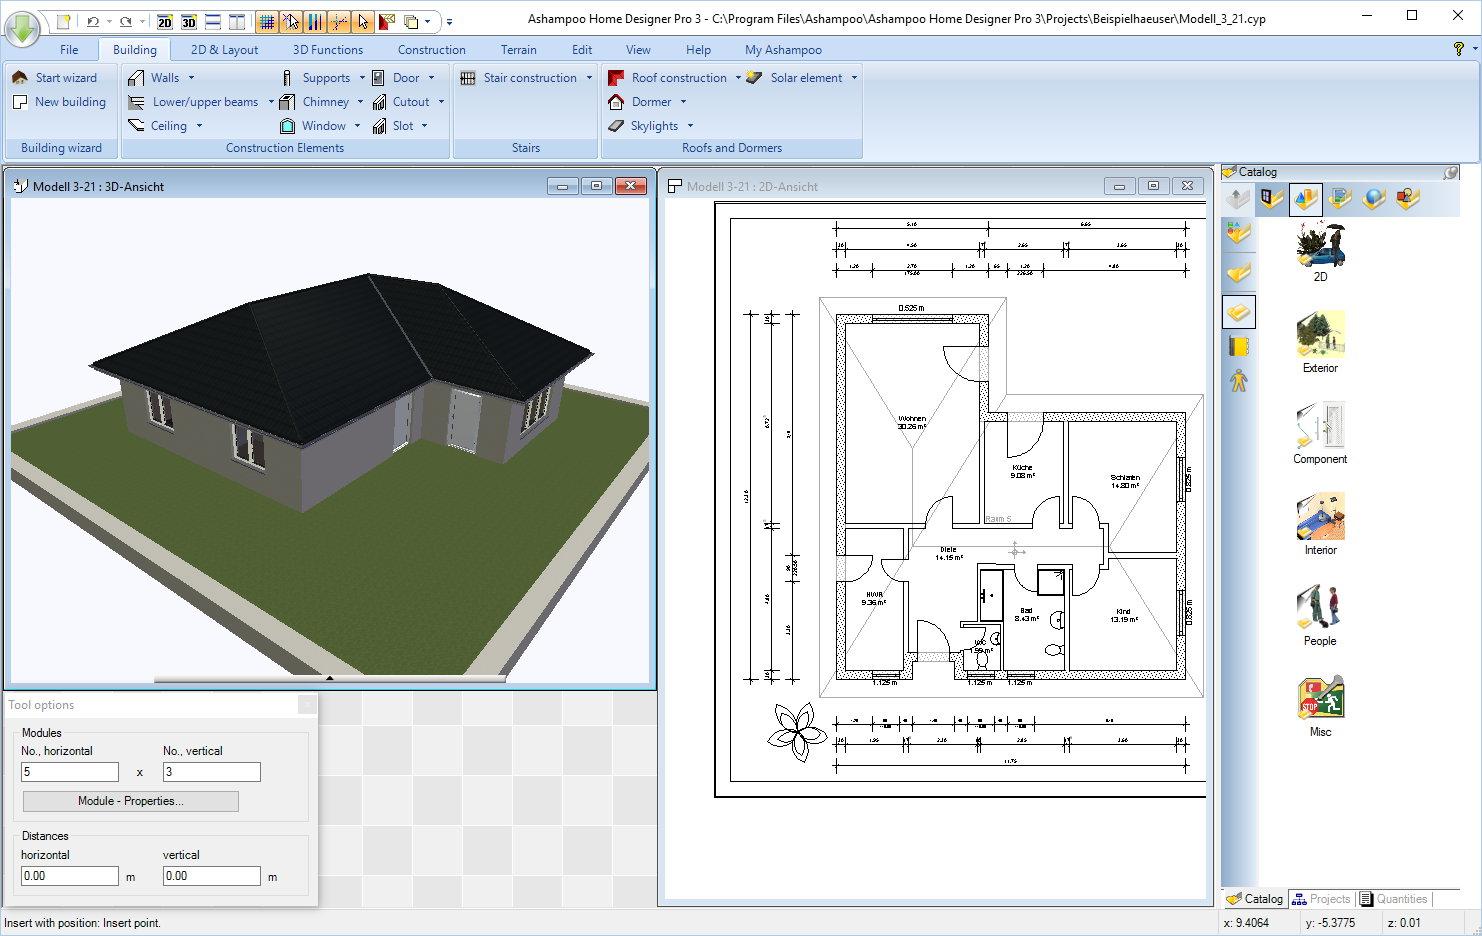 ashampoo home designer pro 3 - Home Designer Pro